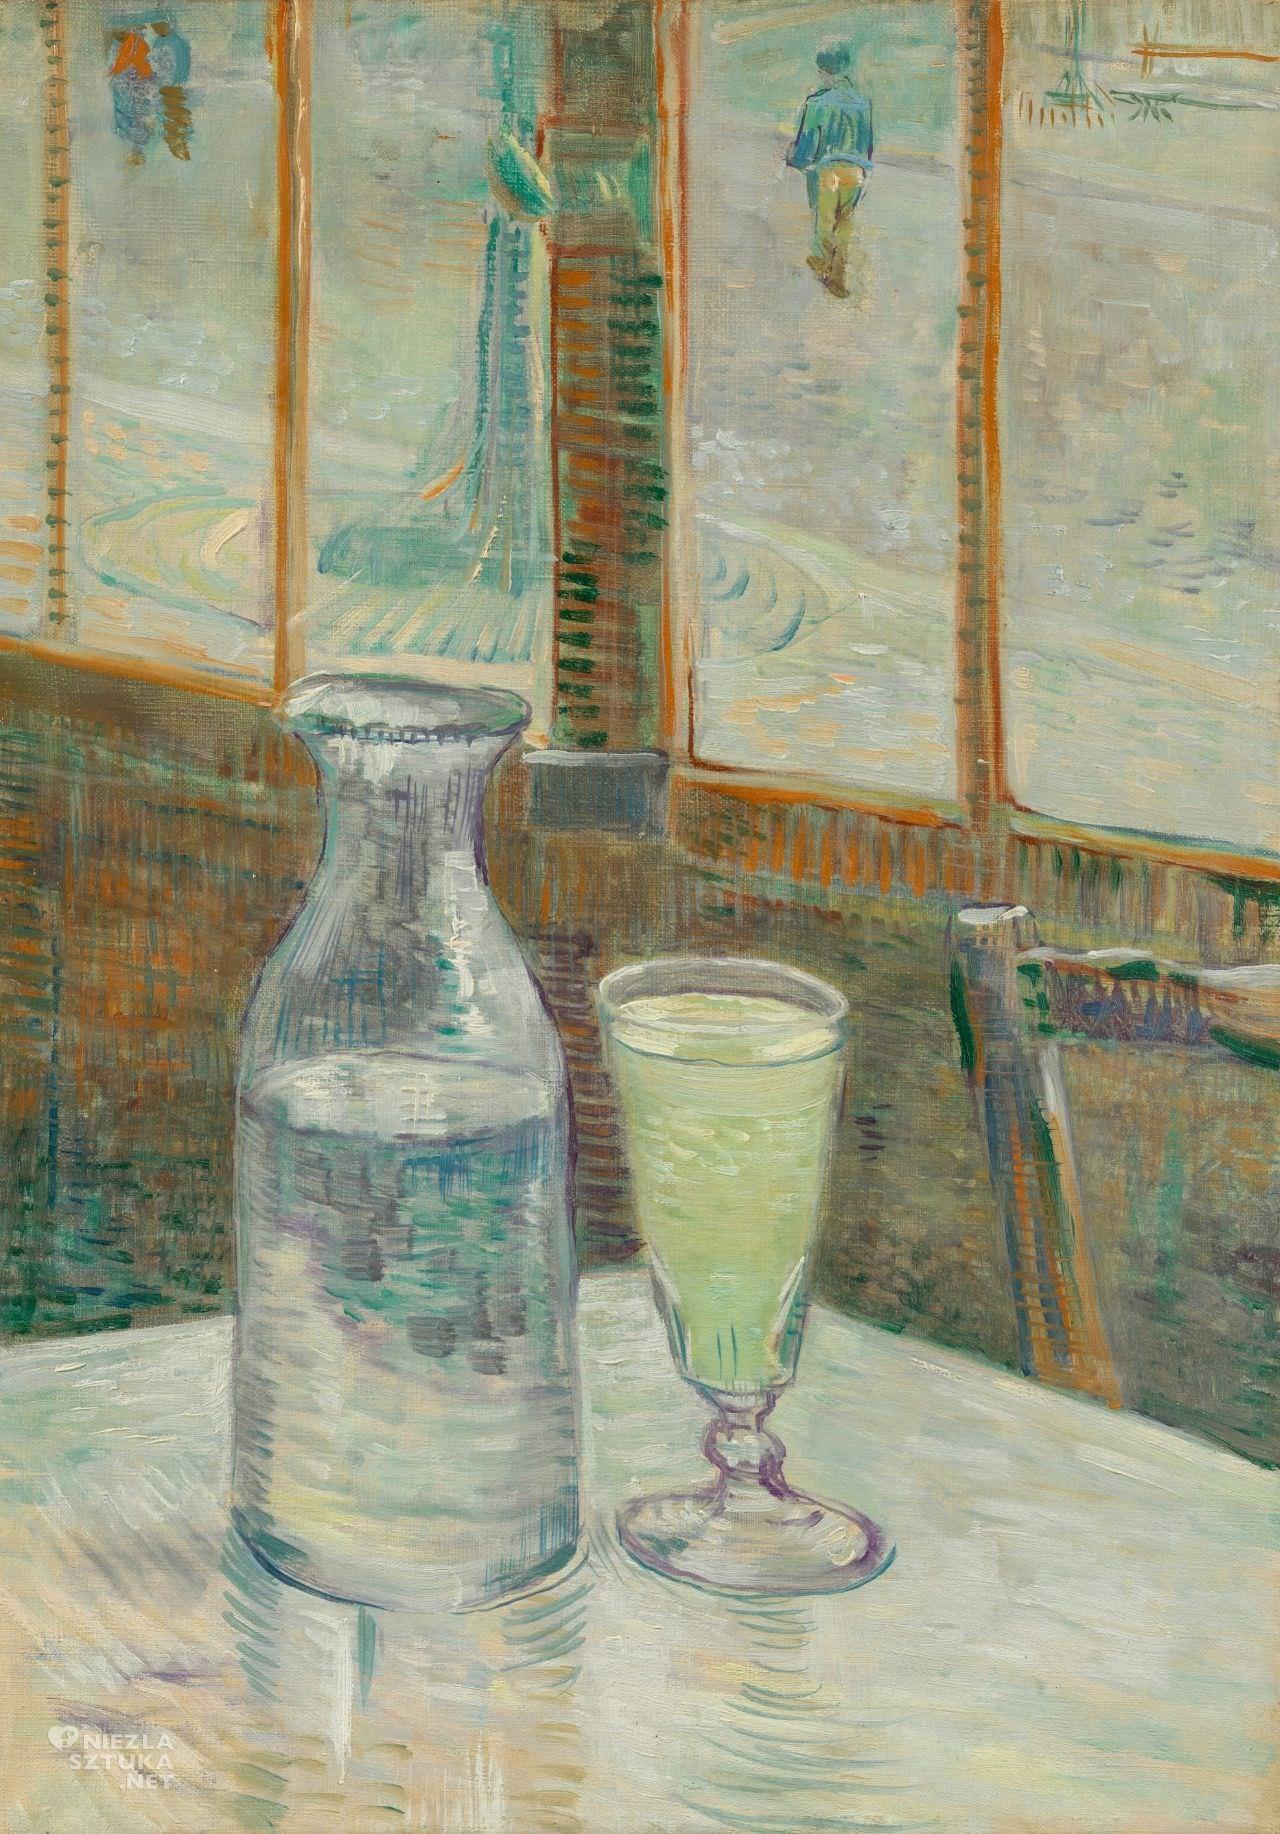 Vincent van Gogh, Kawiarniany stolik z absyntem,Absynt, Zielona Wróżka, Alkohol, Niezła Sztuka